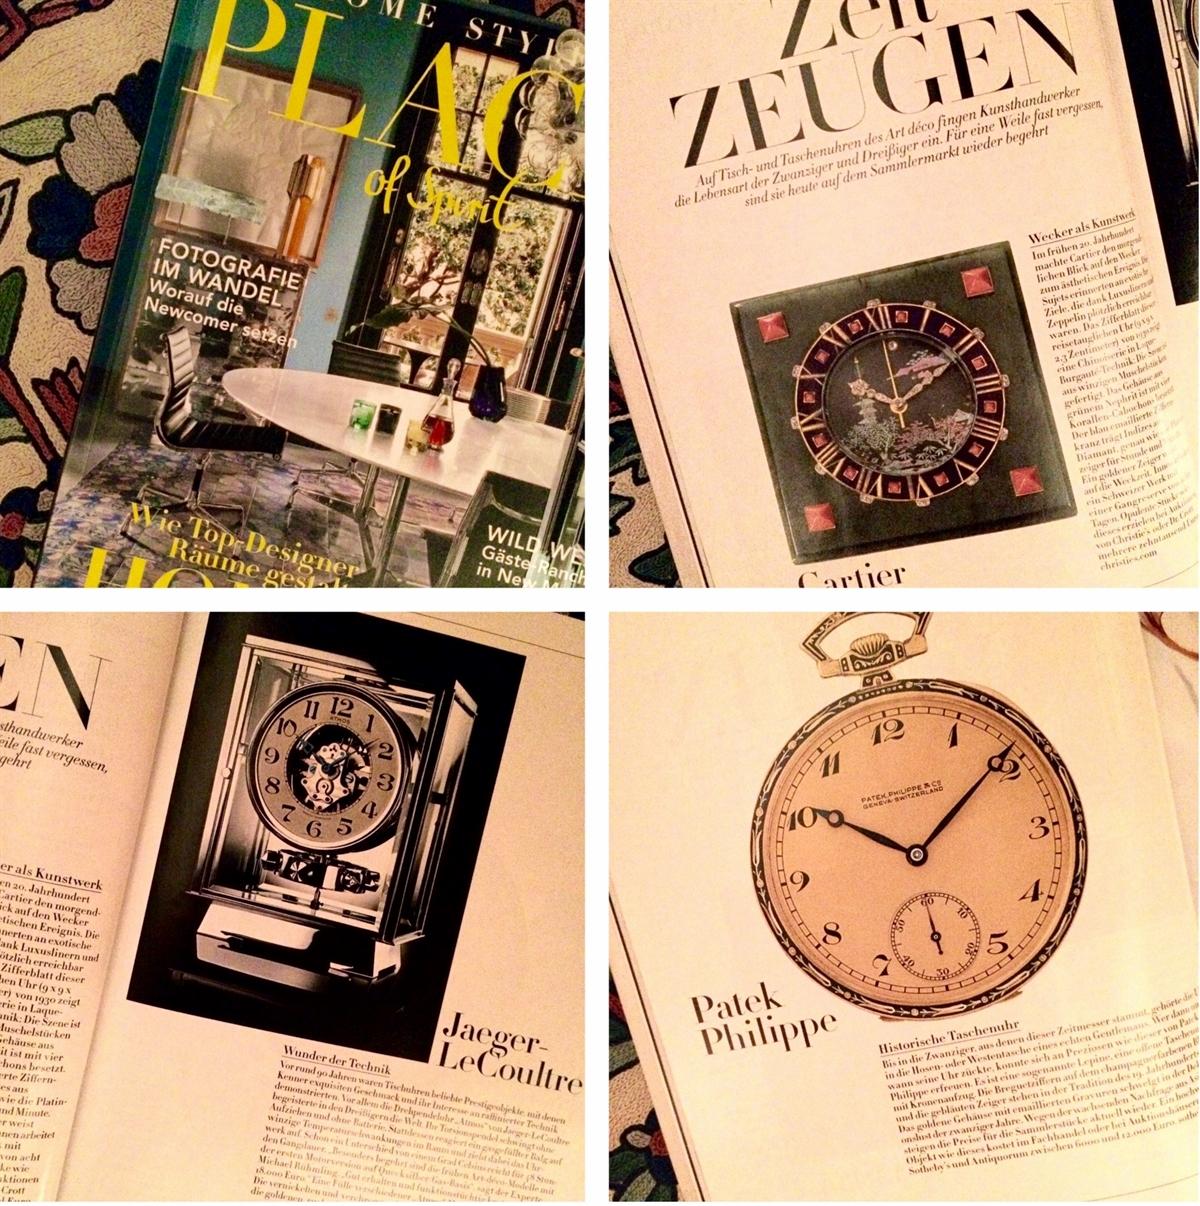 2 design z zegarkiem w ręku luksusowe zegarki SIHH Geneve lifestyle forelements blog